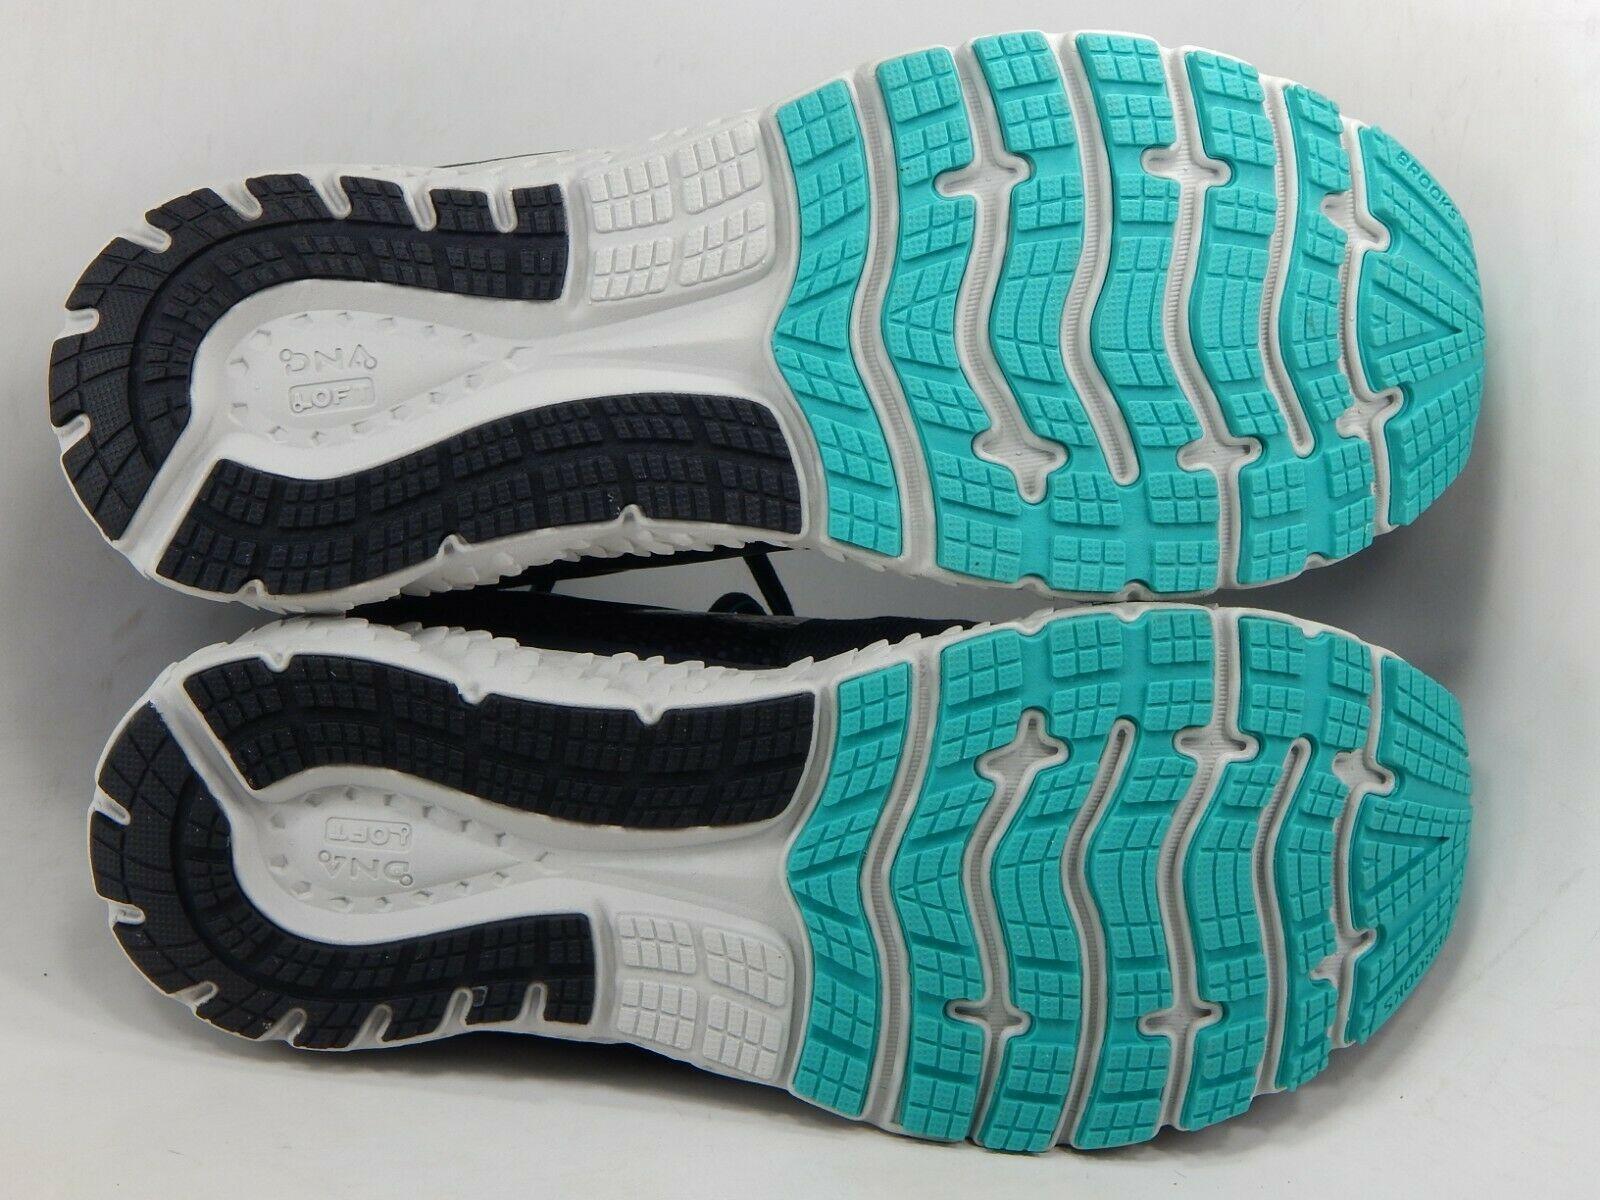 MISMATCH Brooks Glycerin 16 Size 8.5 M (B) Left & 9.5 M (B) Right Women's Shoes